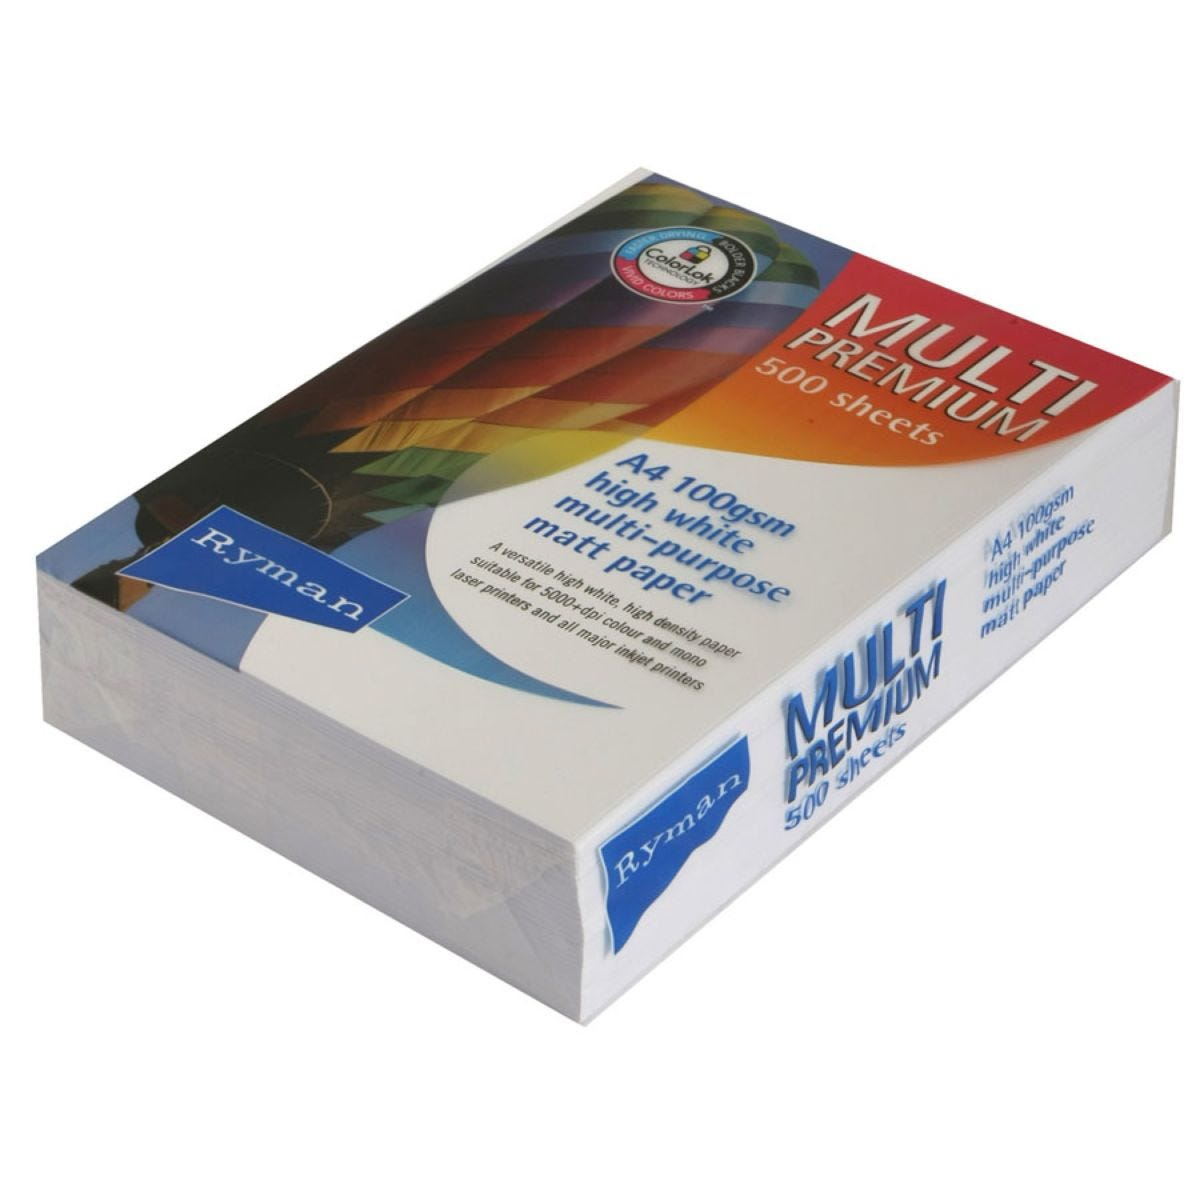 Ryman A4 Premium Copy Paper – 500 Sheets